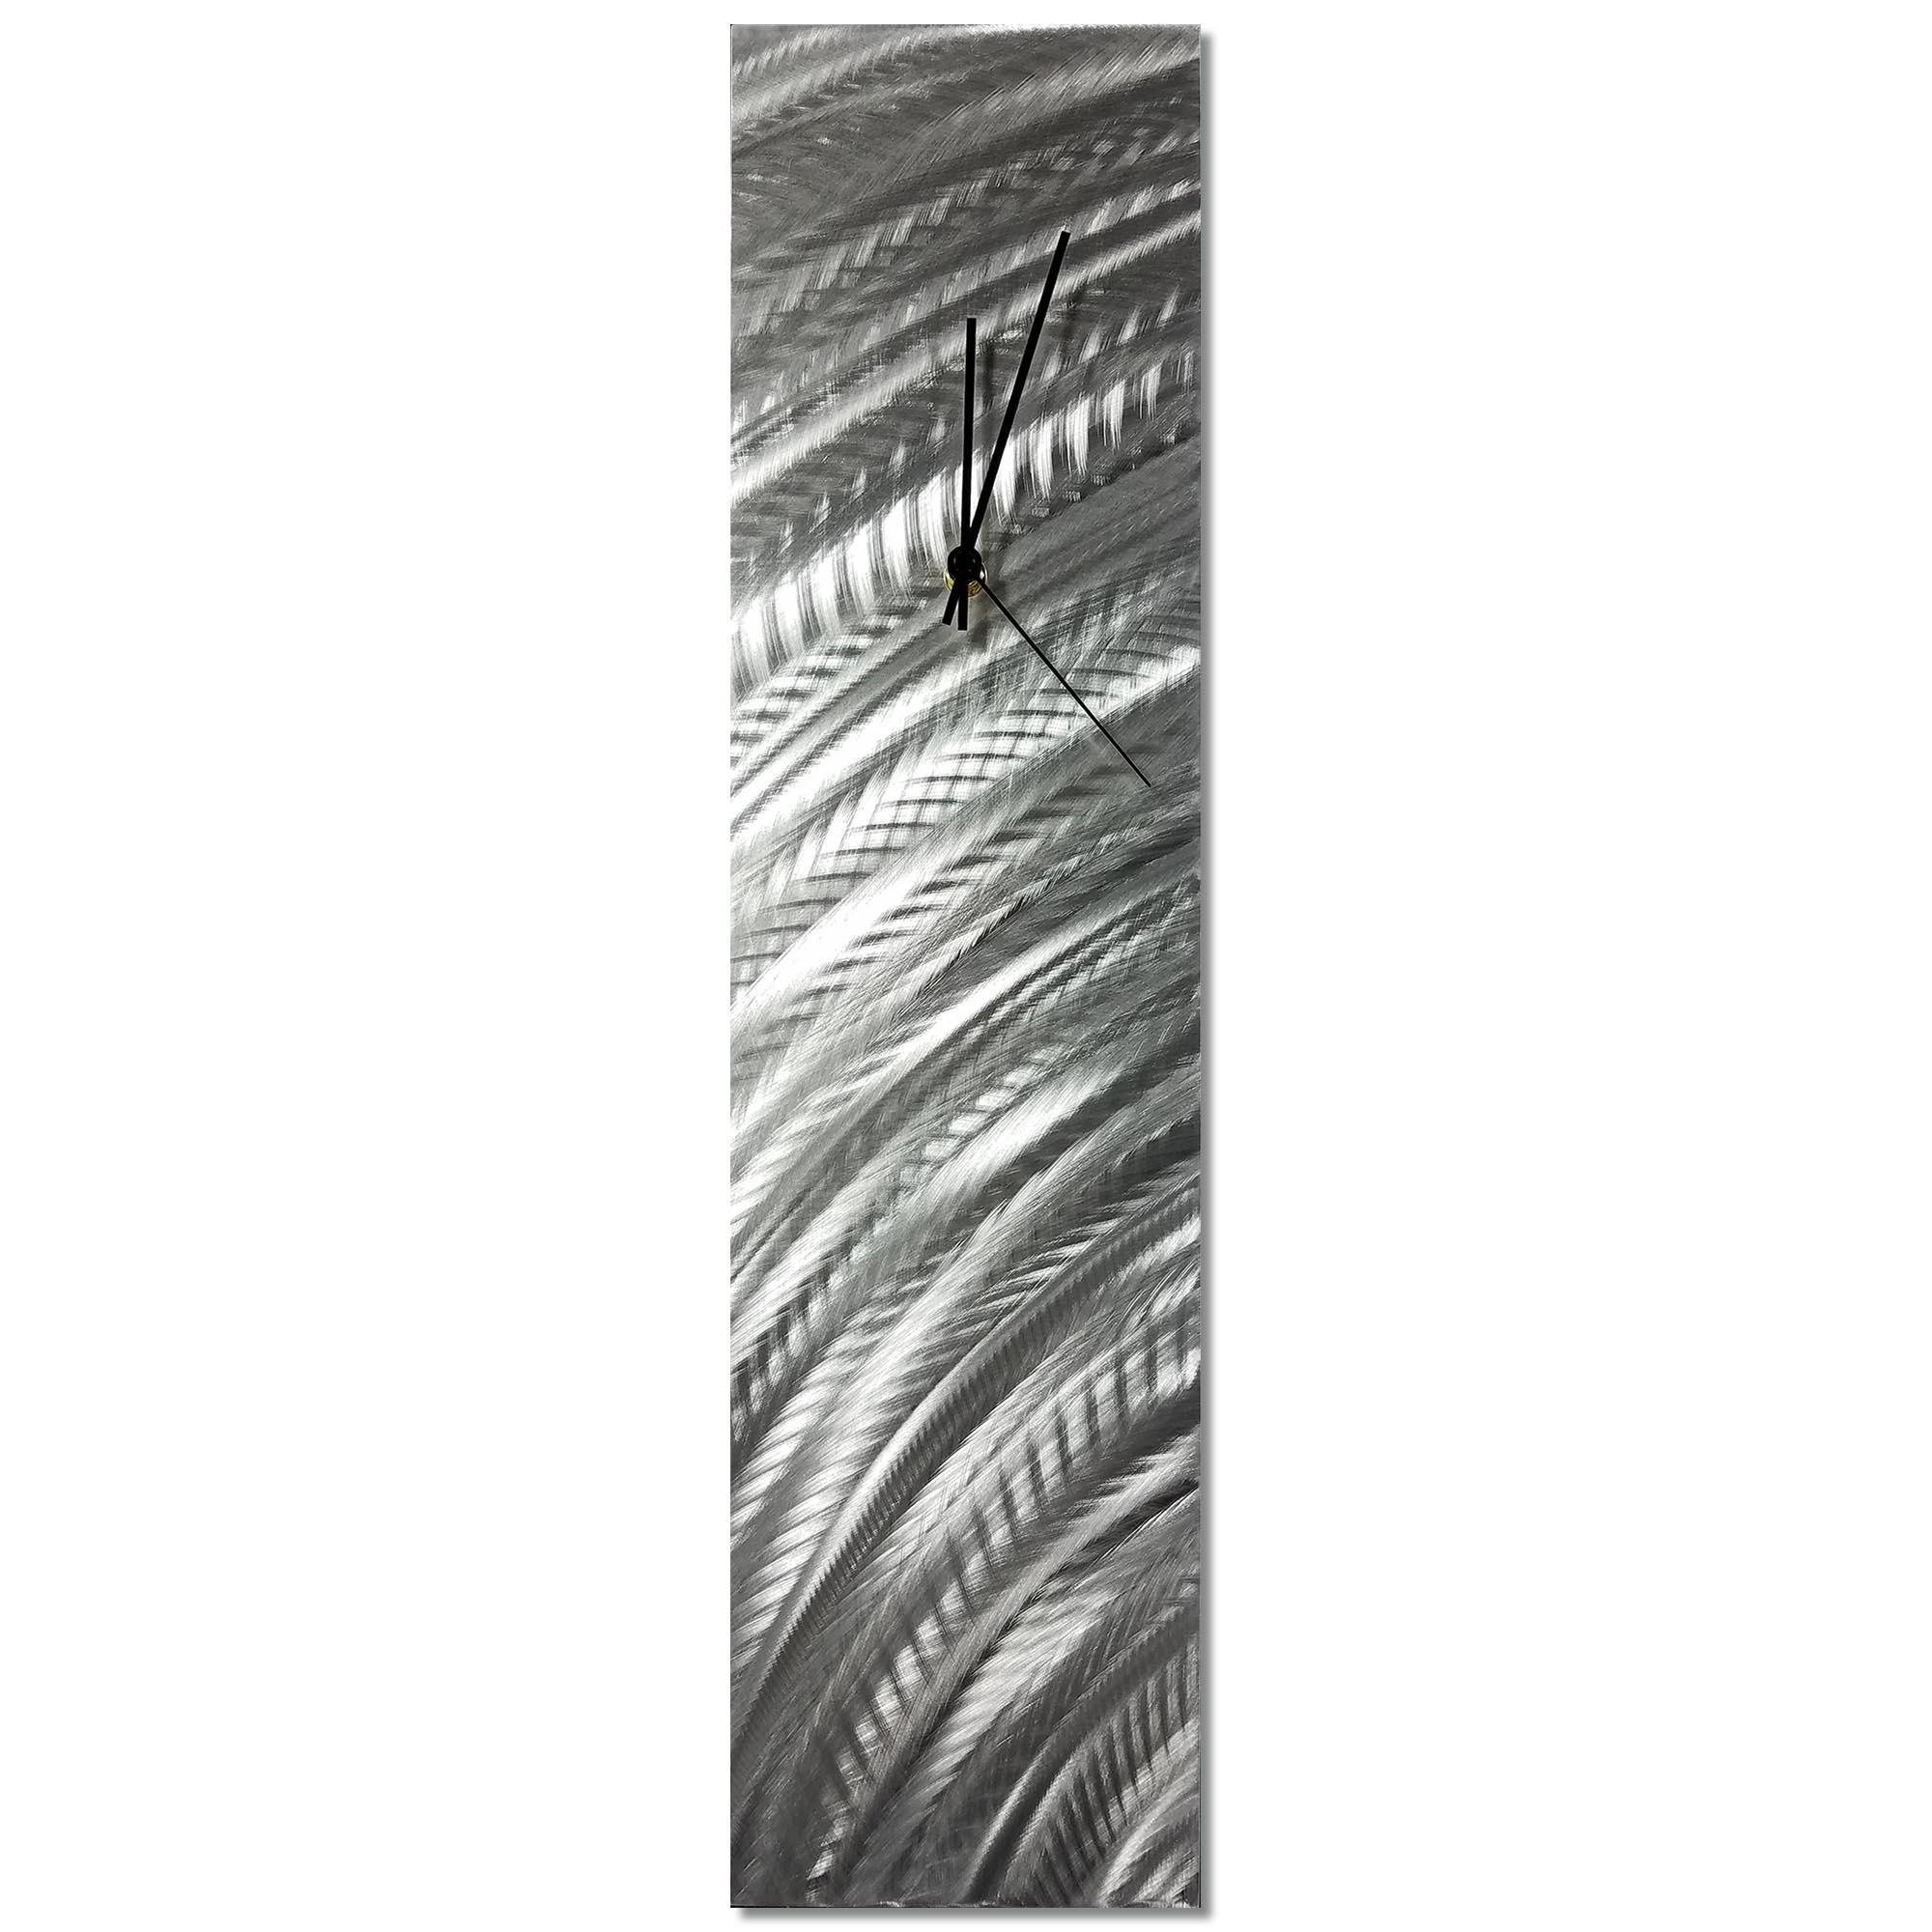 Silver Curves Clock 6x24in. Natural Aluminum